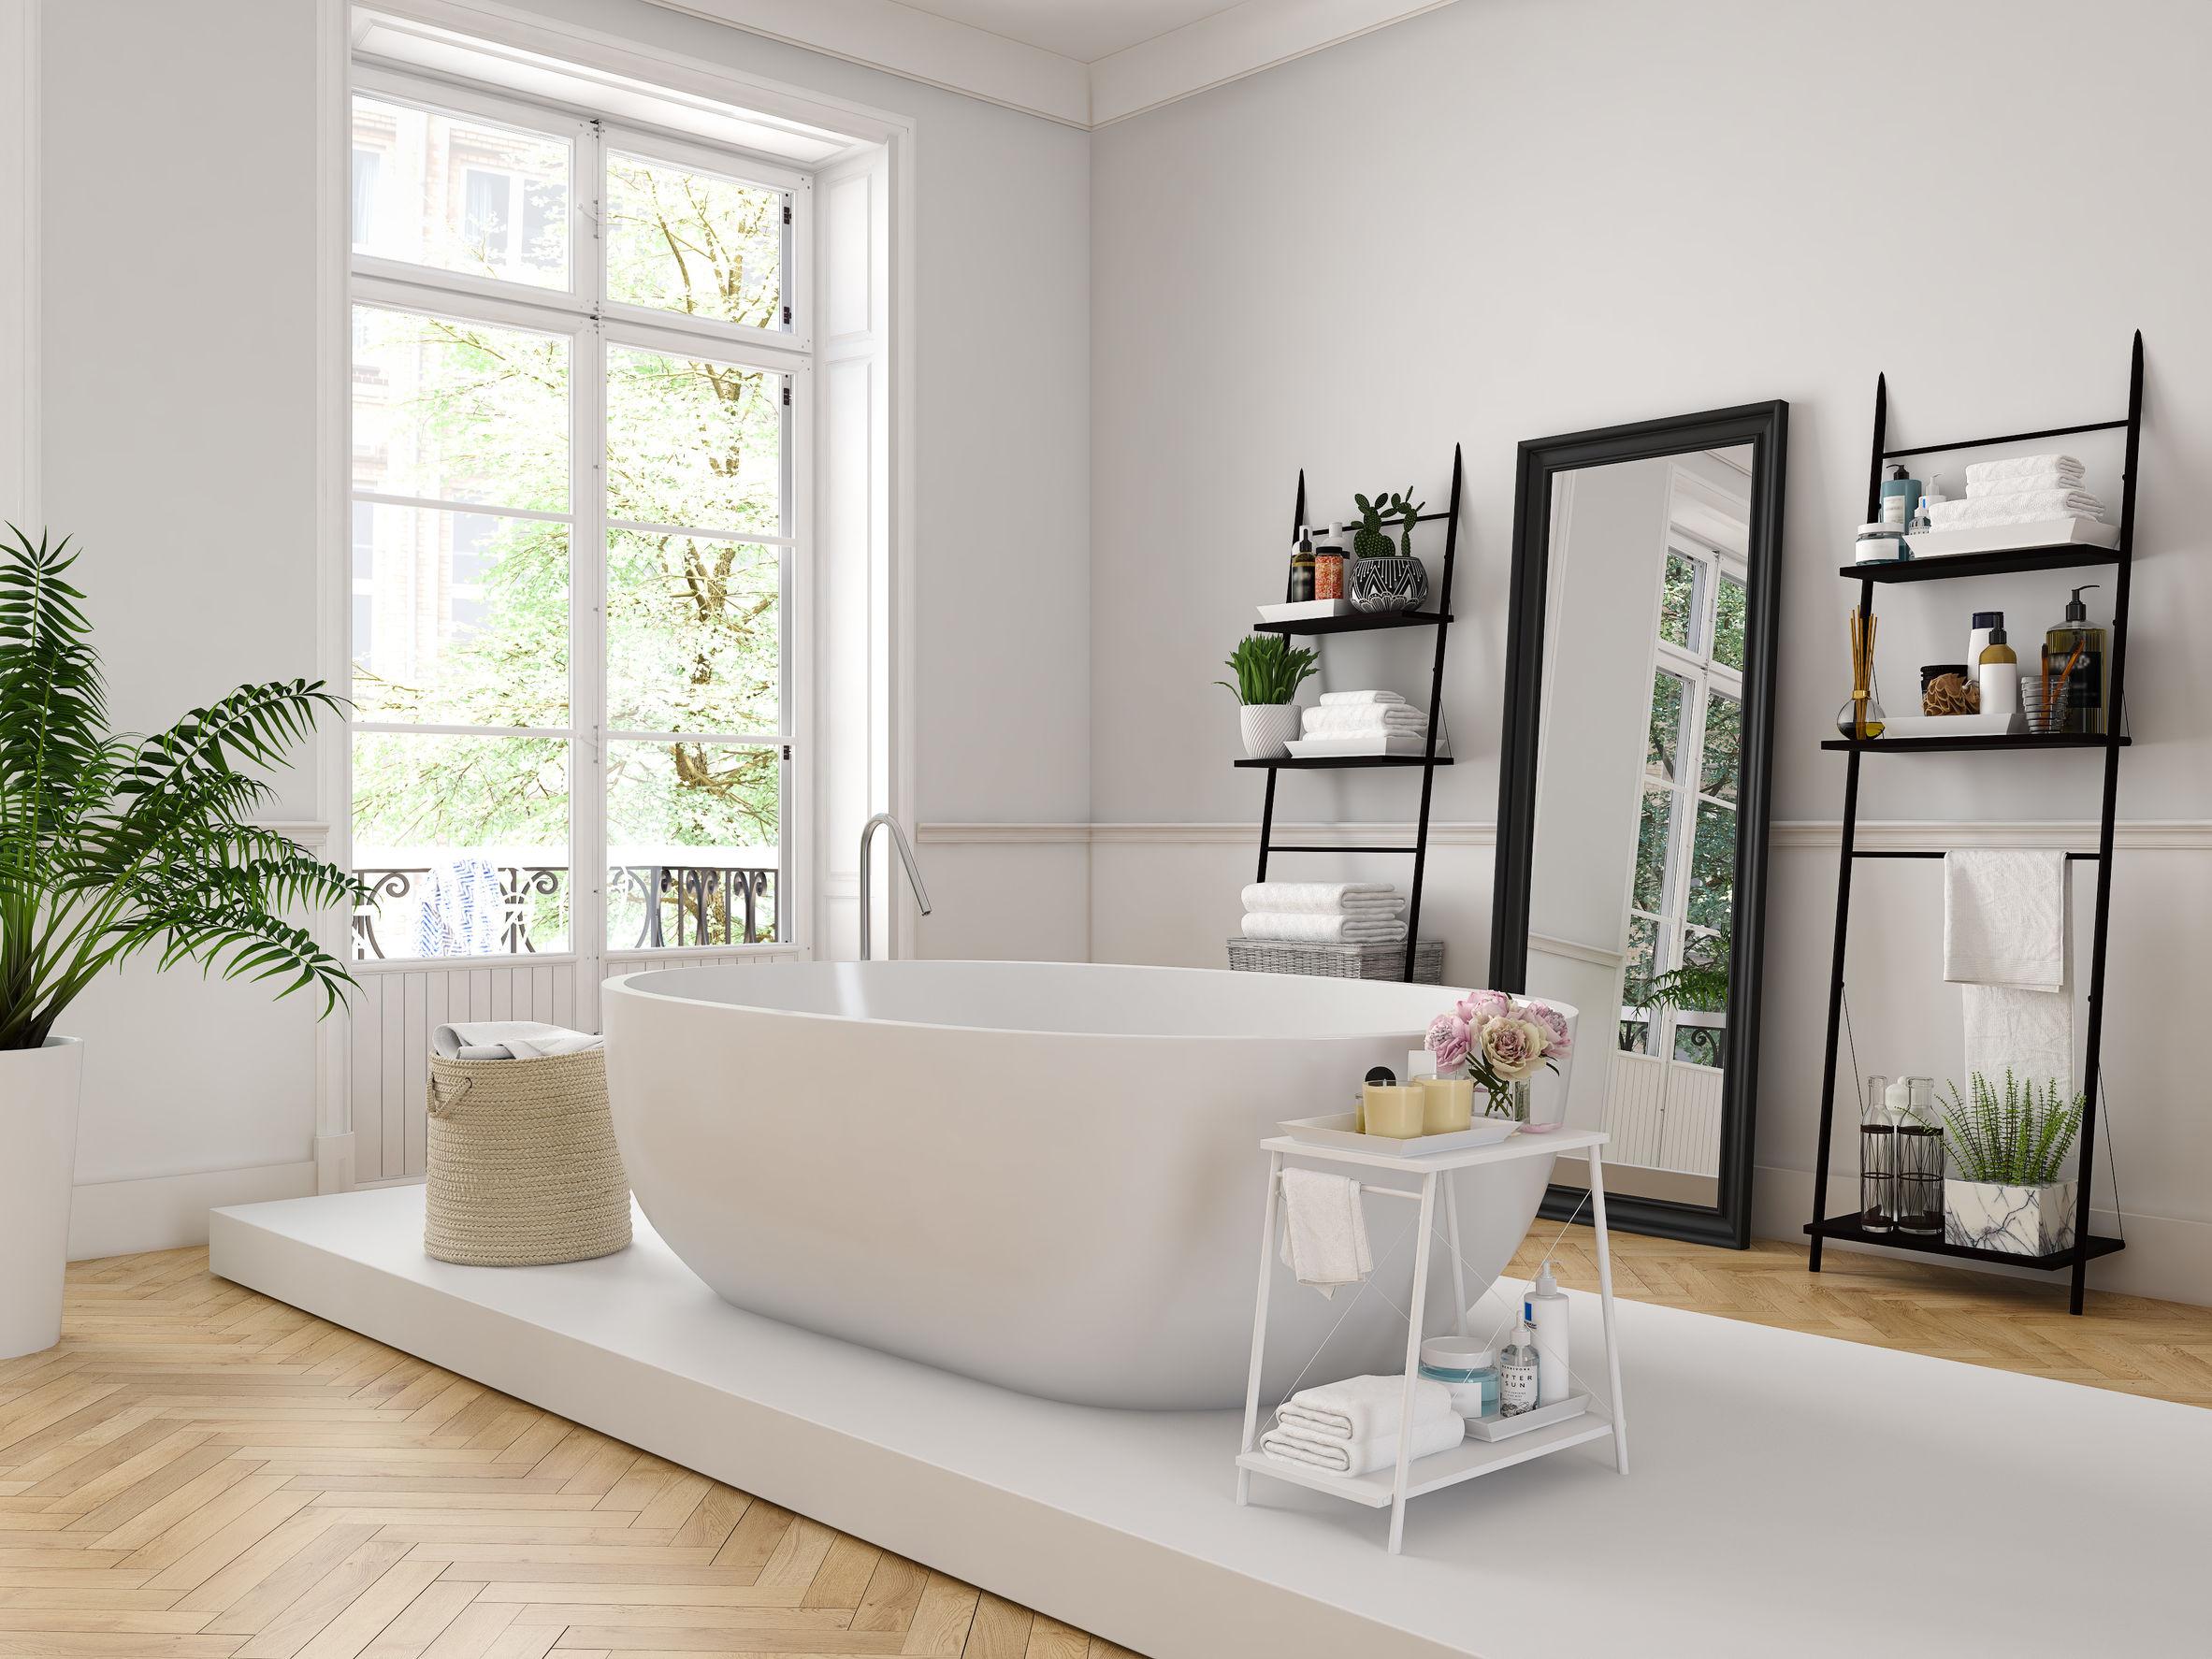 Imagen de baño con bañera